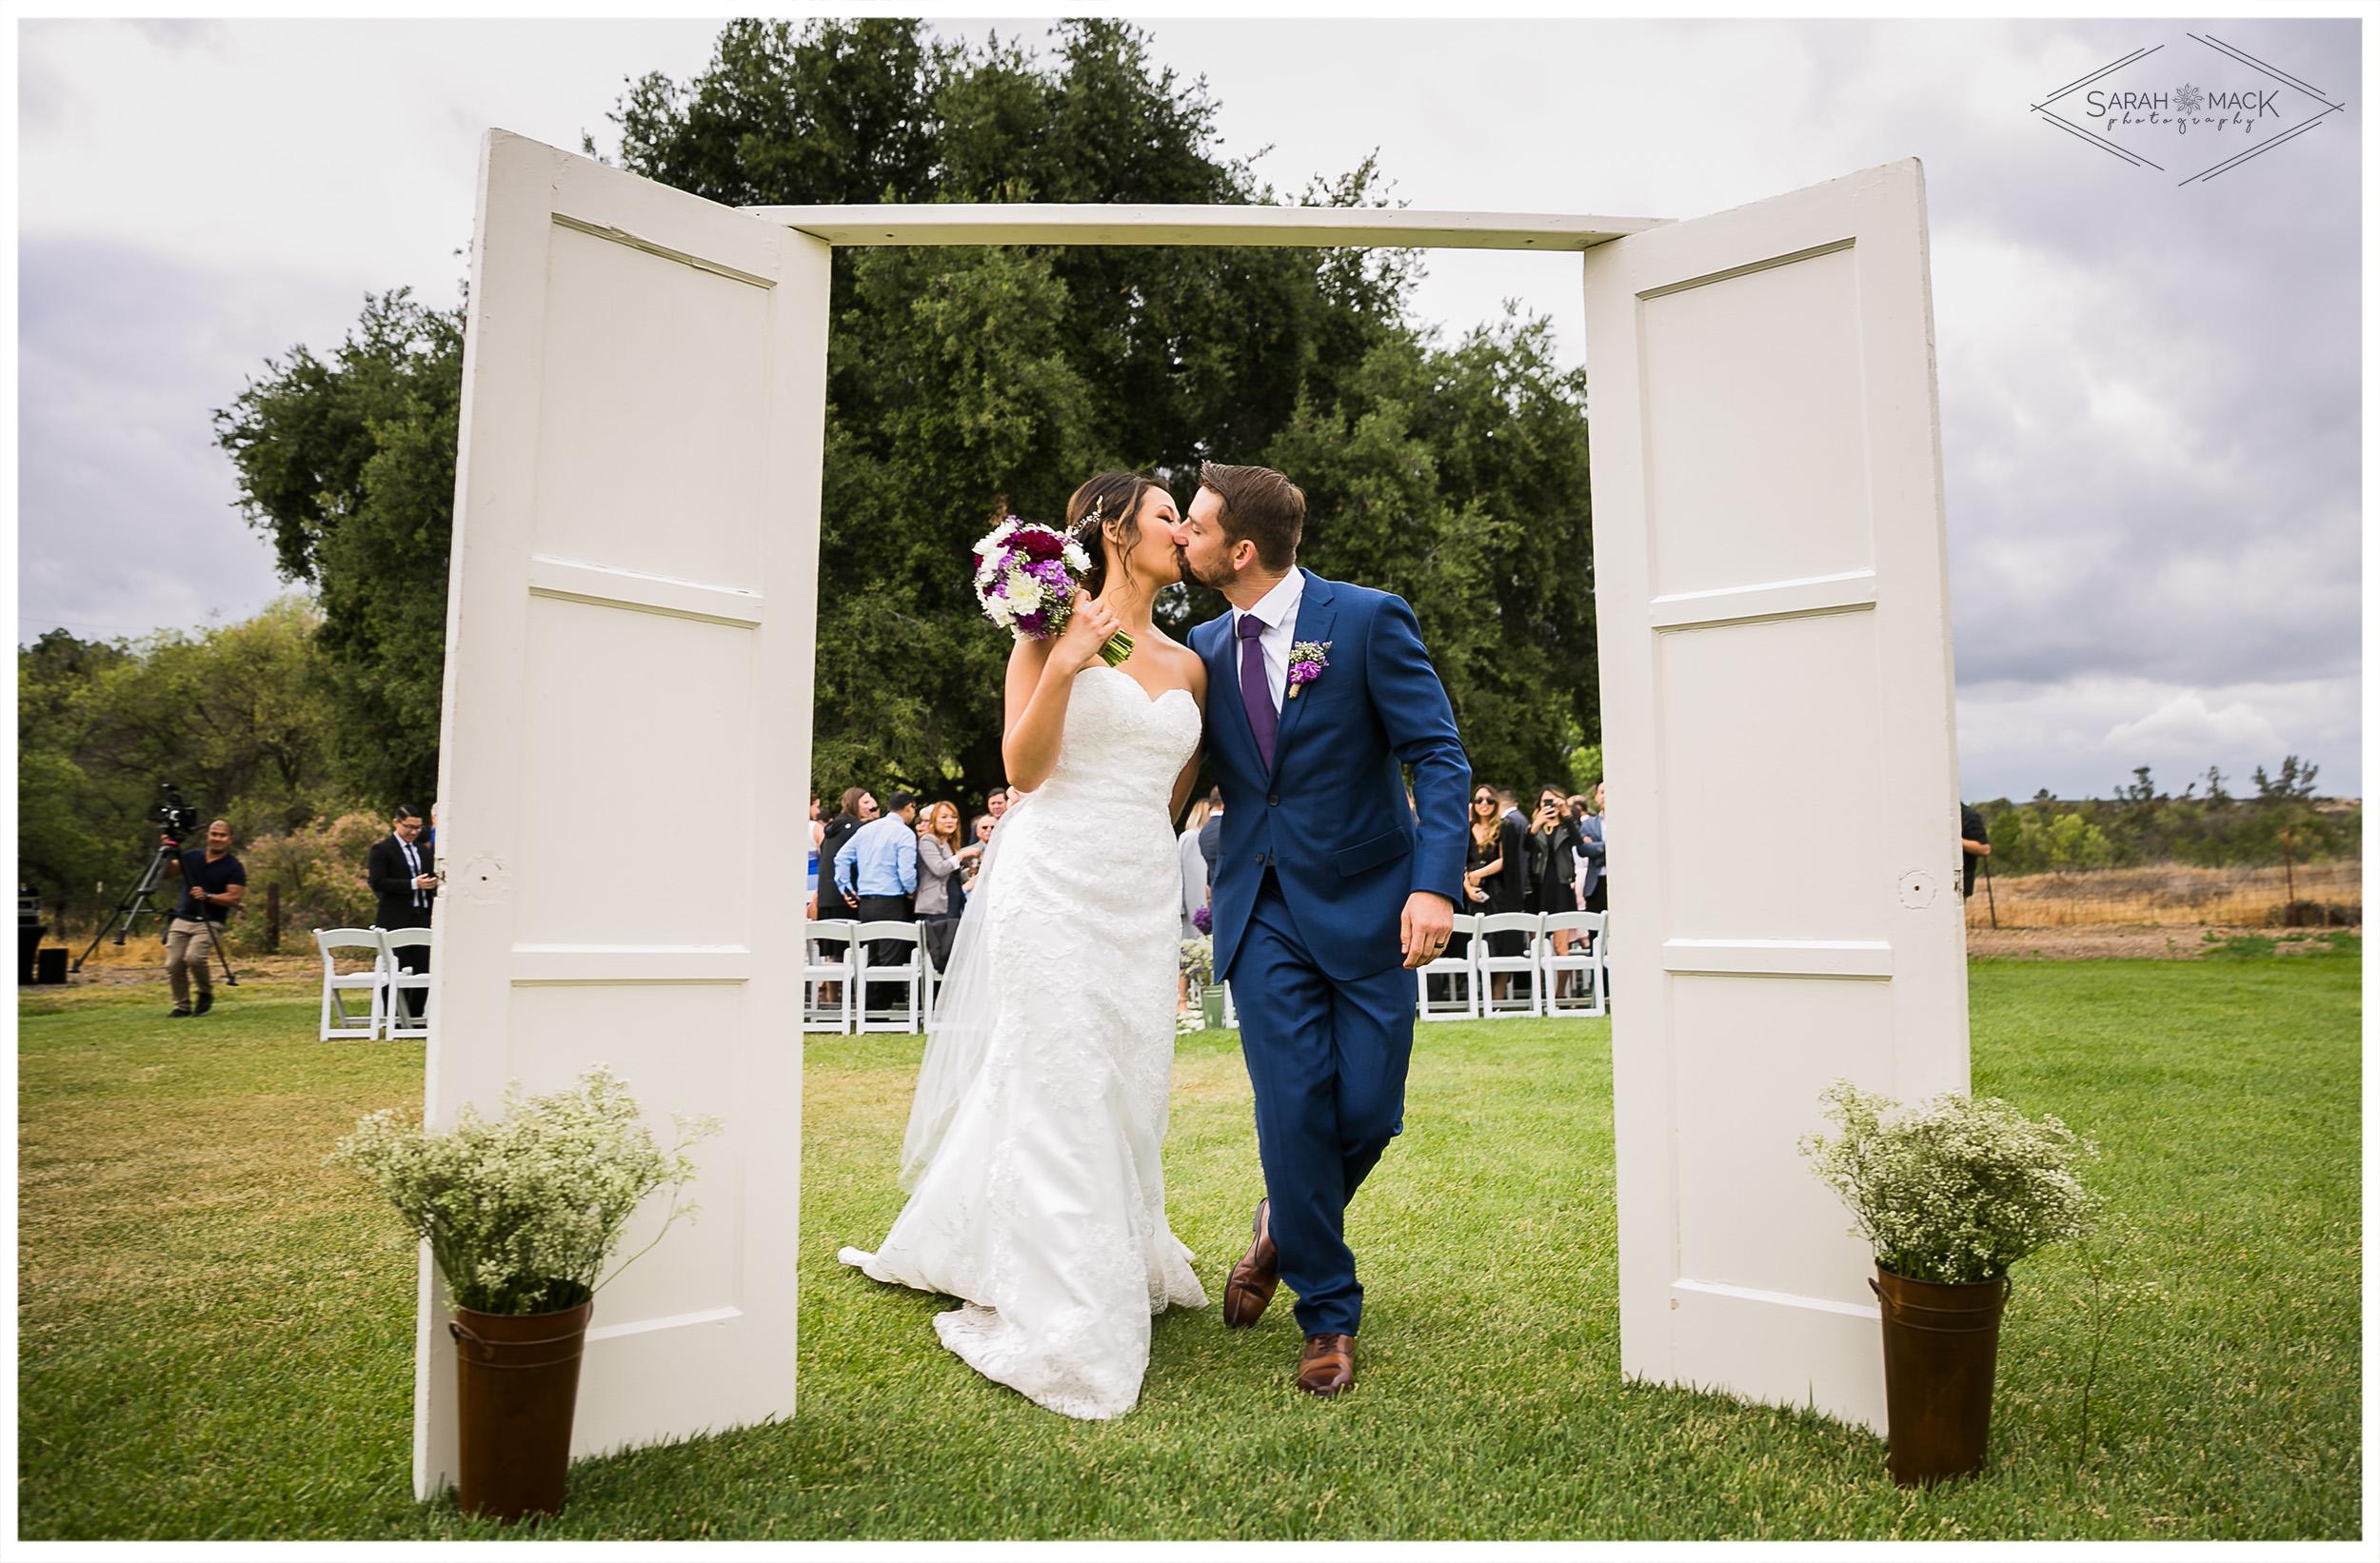 PG-Owl-Creek-Farms-Temecula-Wedding-Photography-41.jpg